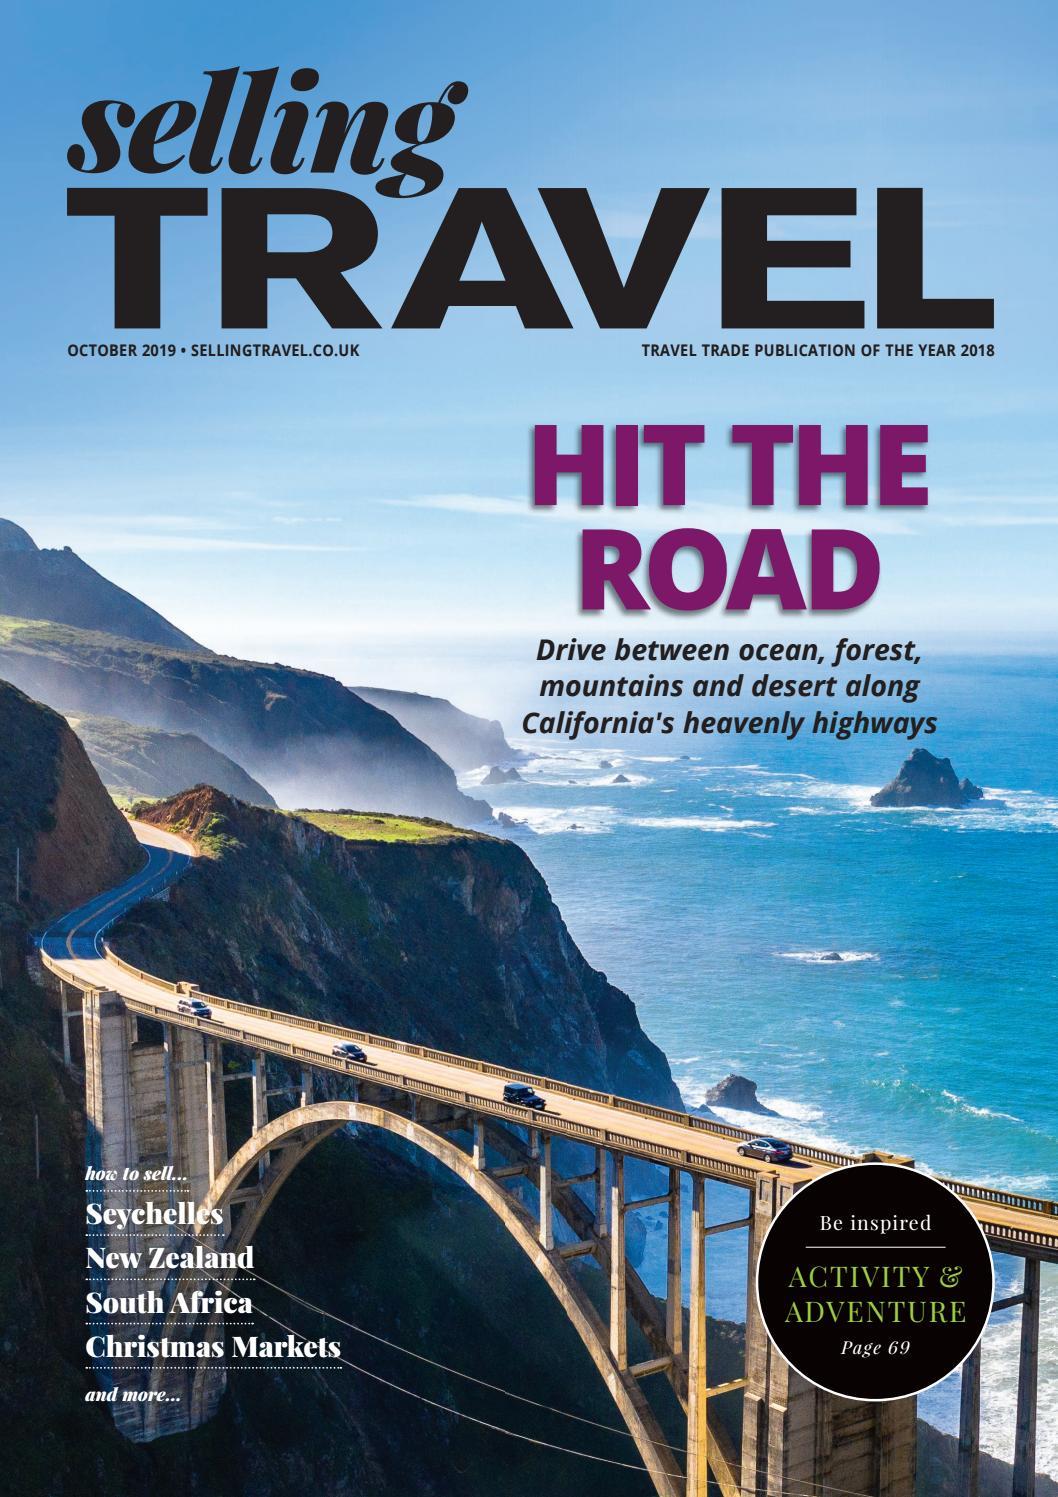 Selling Travel Magazine October 2019 By Bmi Publishing